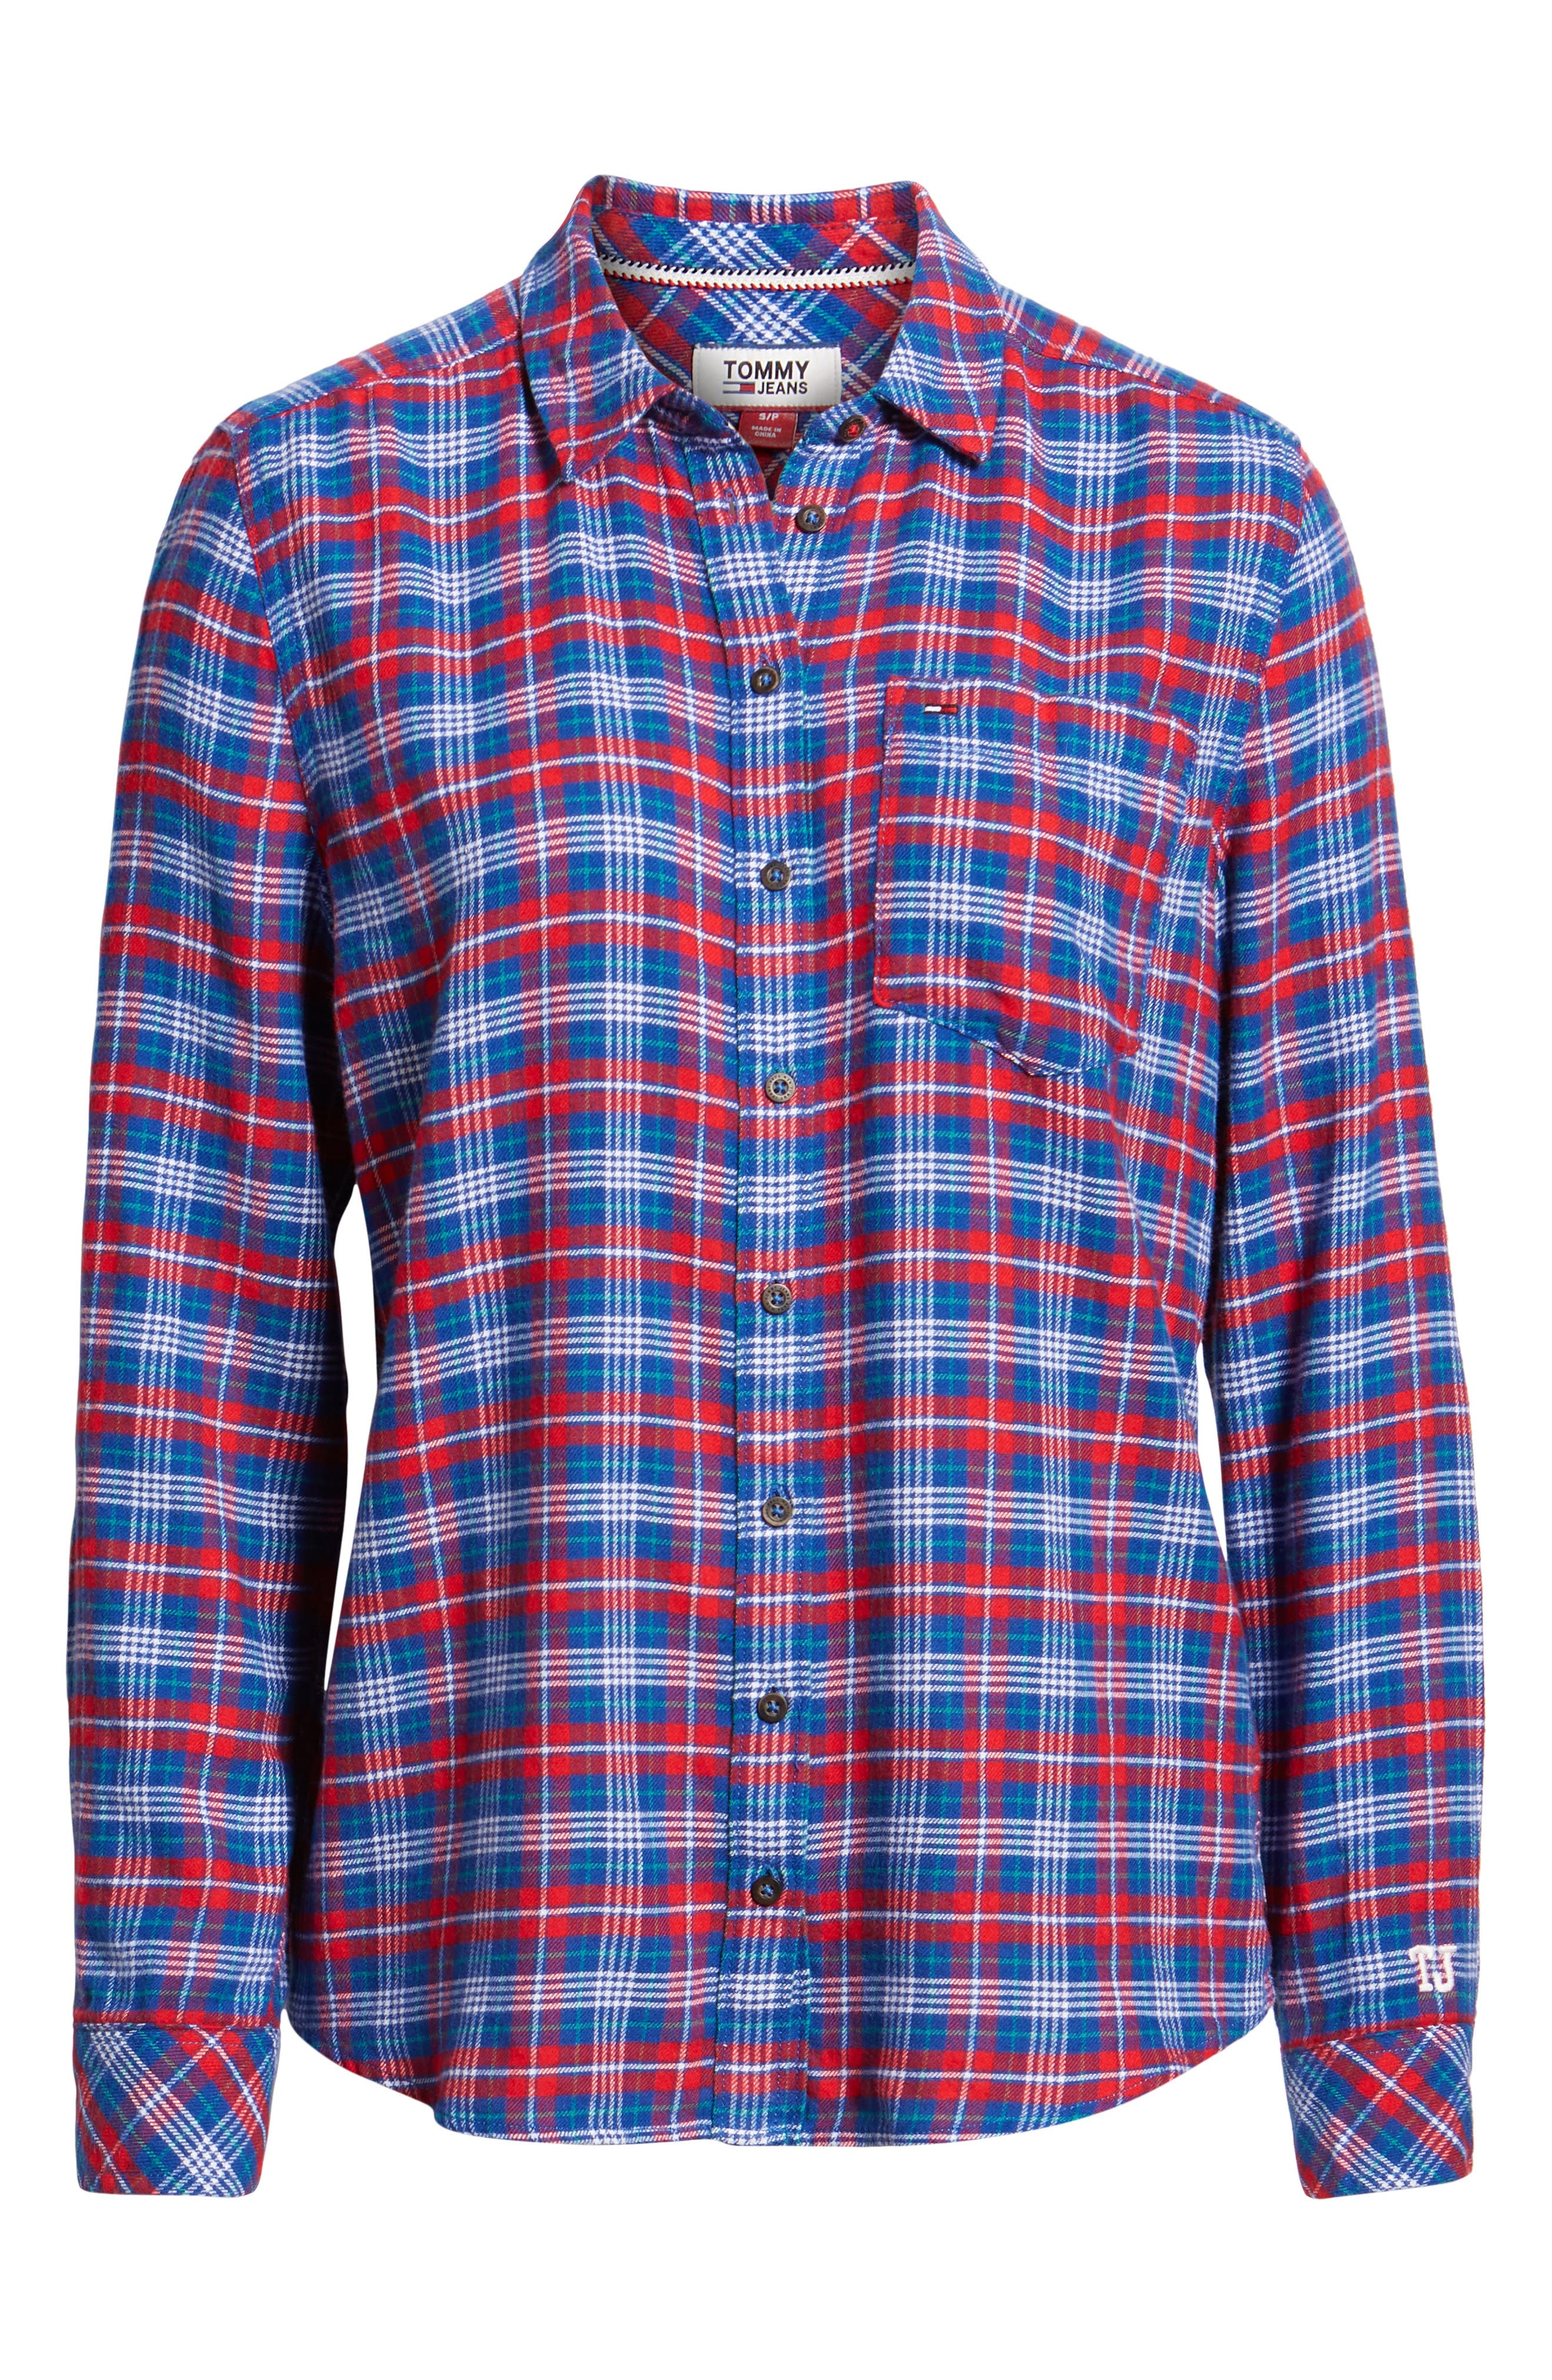 Multicolor Check Shirt,                             Alternate thumbnail 6, color,                             MULTI COLOR CHECK